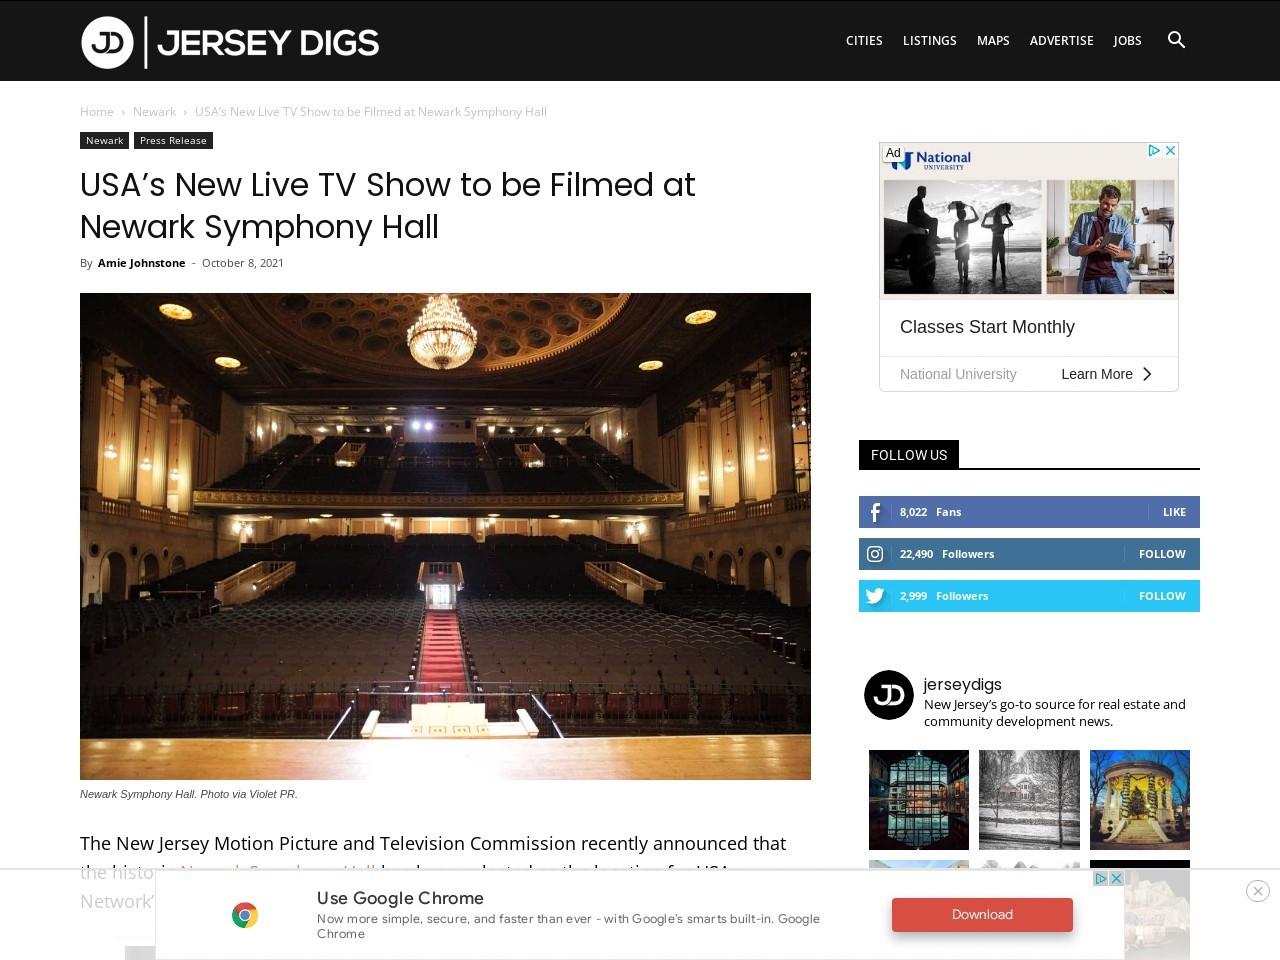 USA's New Live TV Show to be Filmed at Newark Symphony Hall